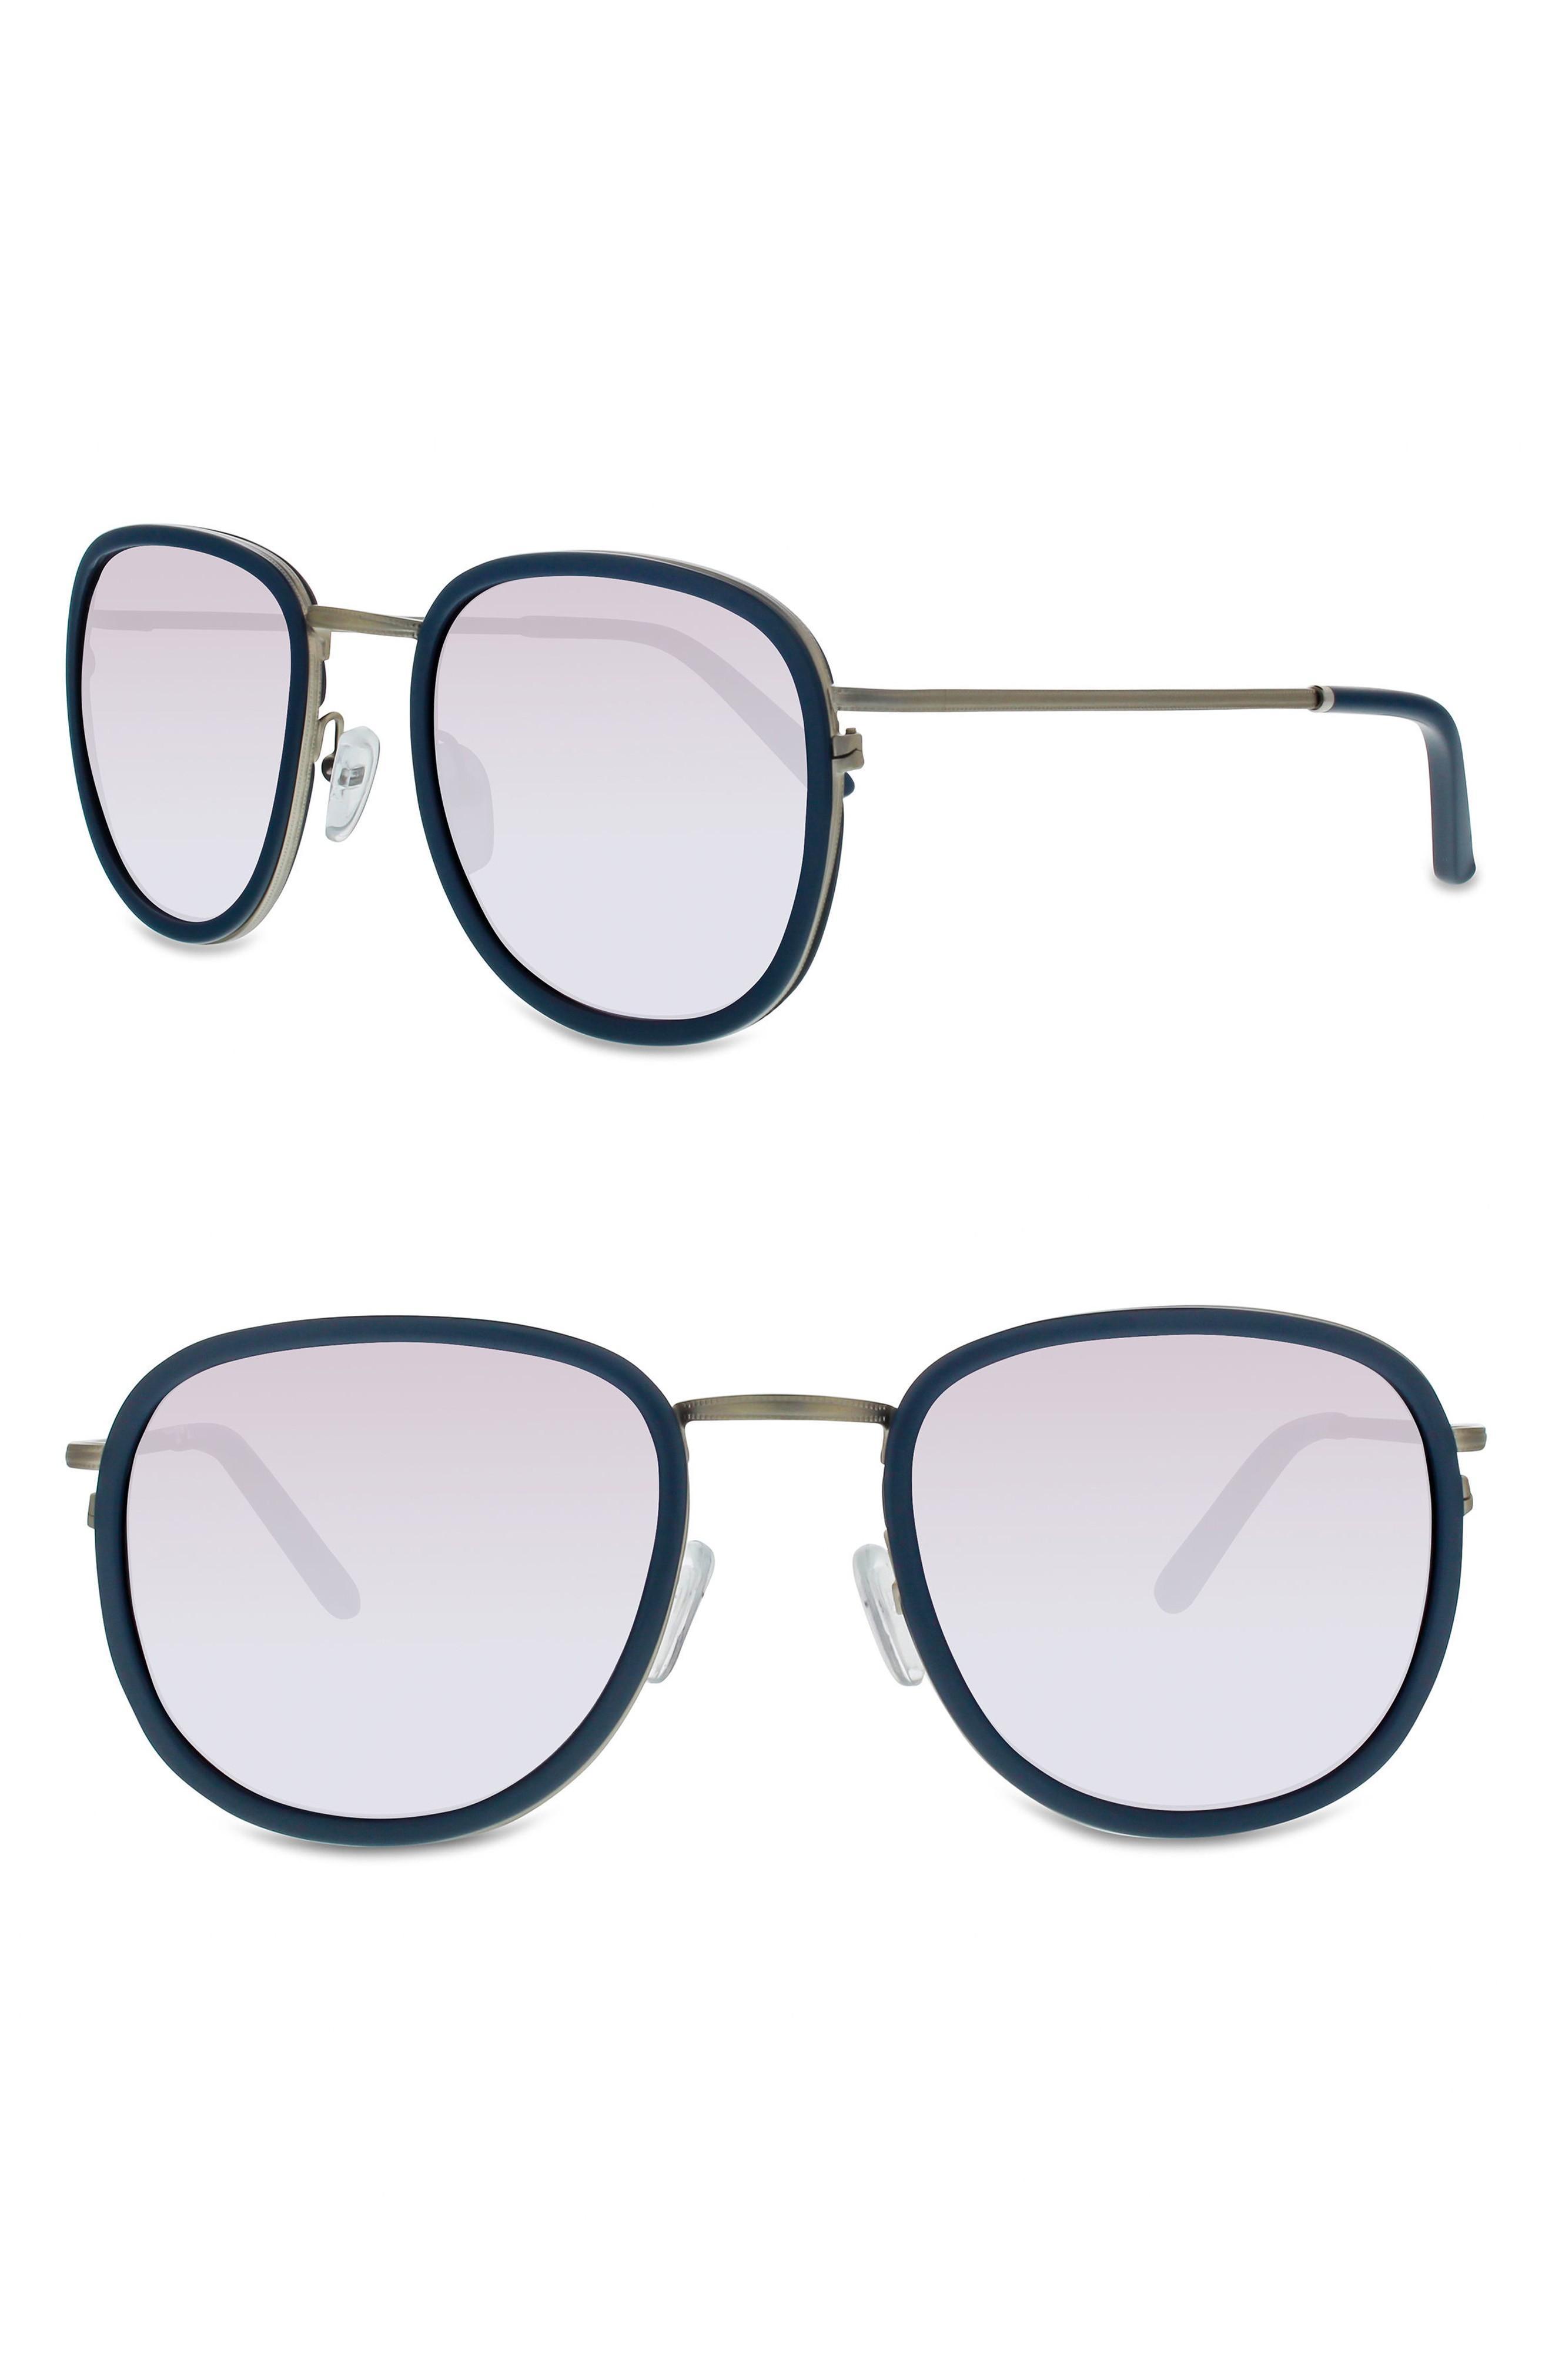 bacbf0f3be2 Smoke X Mirrors 51Mm Sunglasses In Milky Grey  Silver Mirror